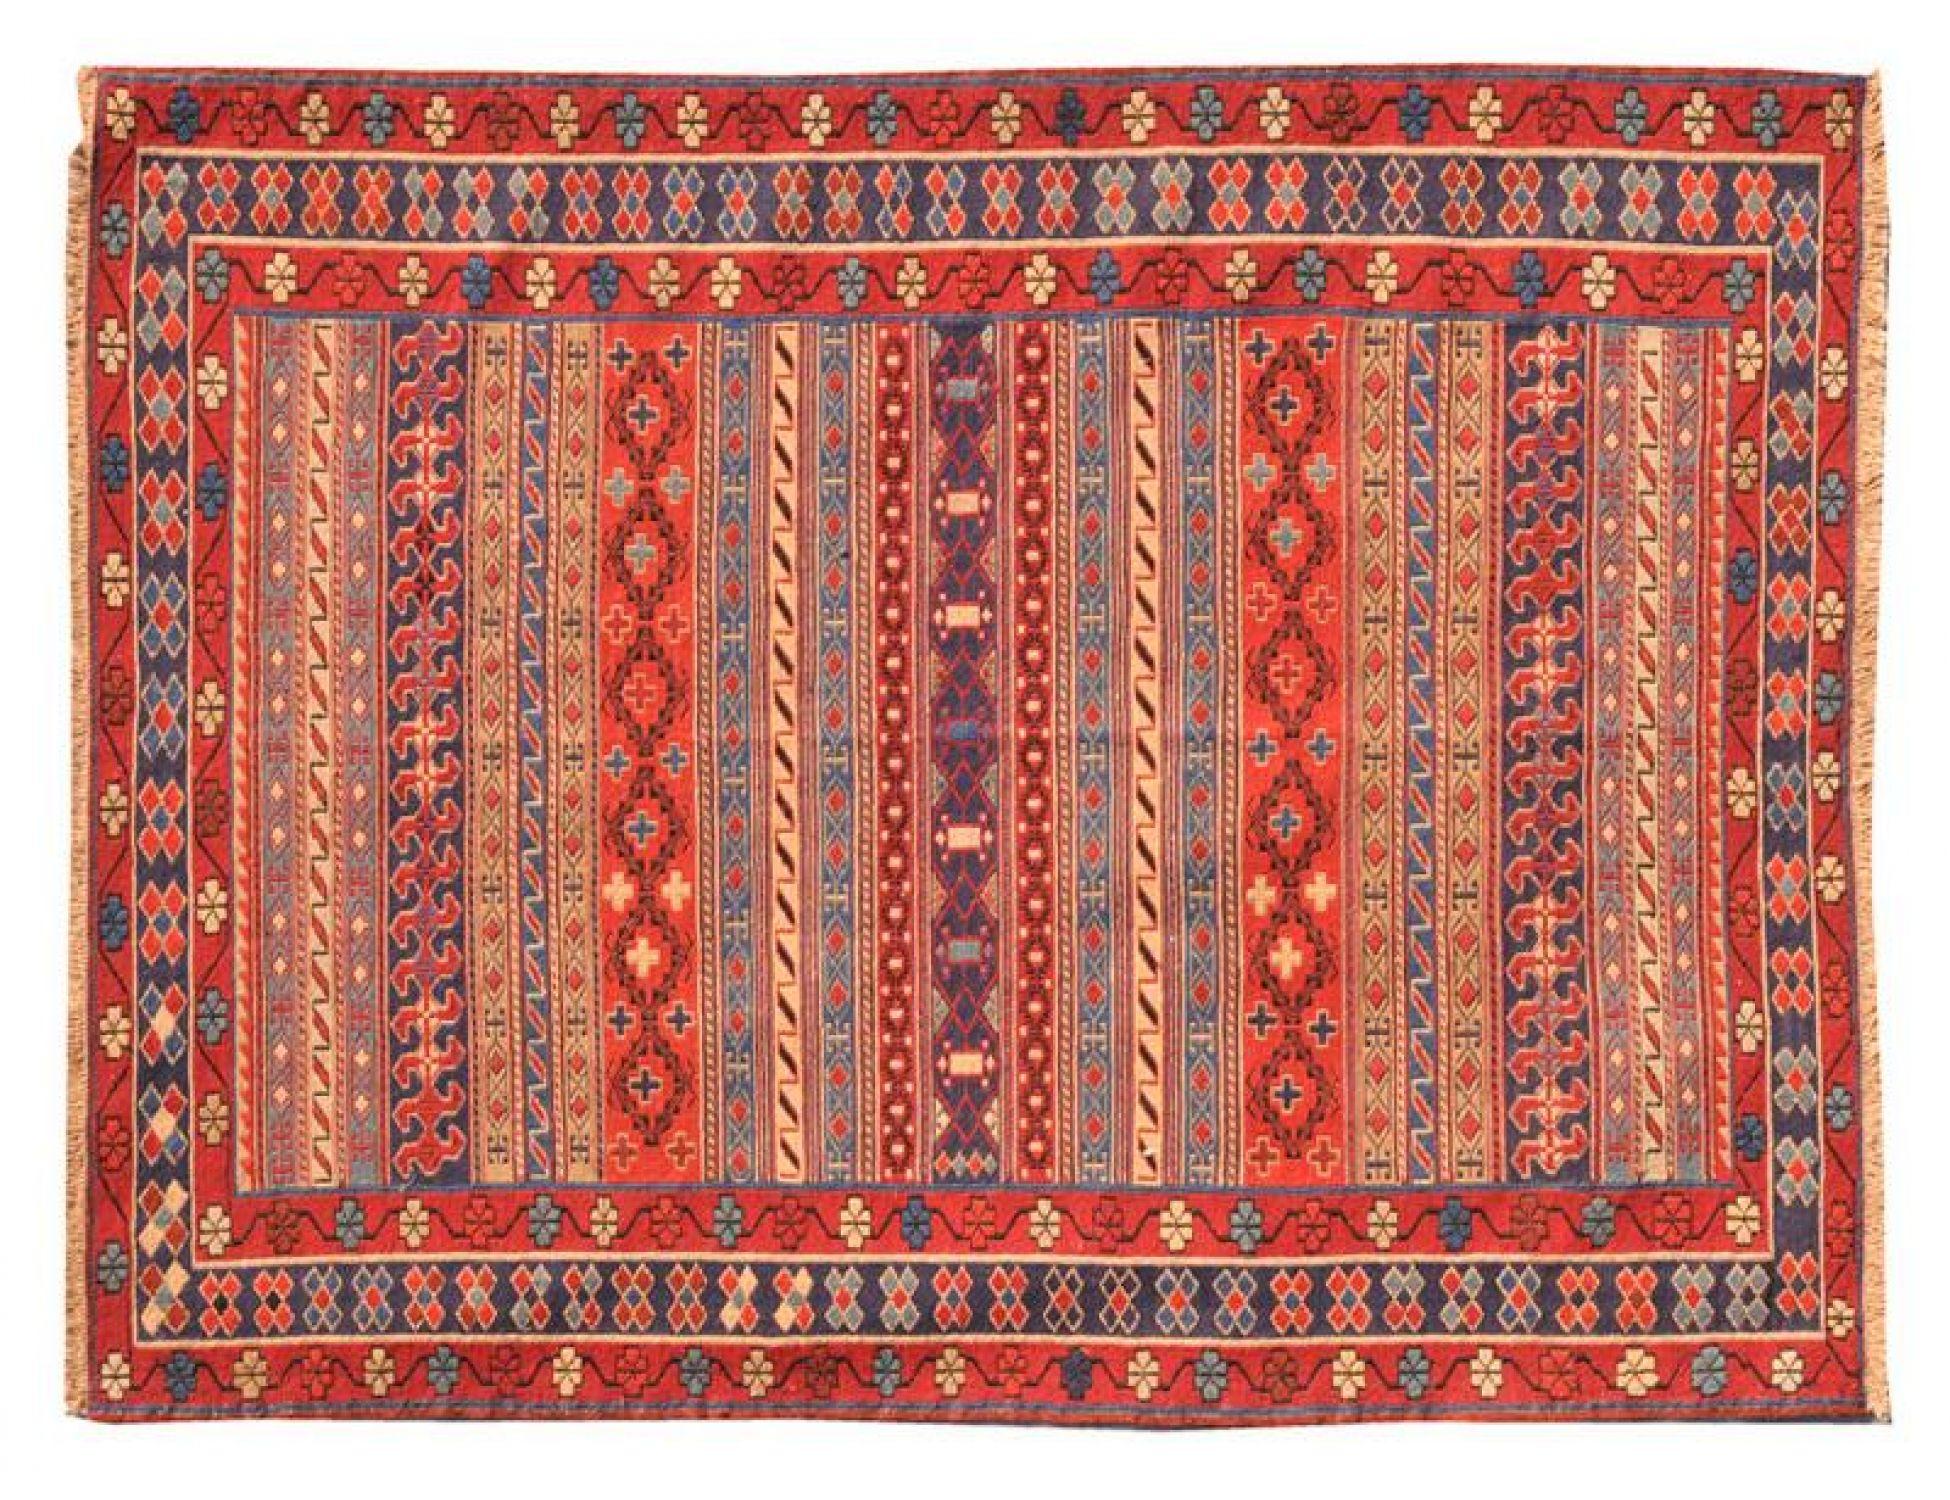 PERSIAN WOOL KILIMS   <br/>197 x 125 cm